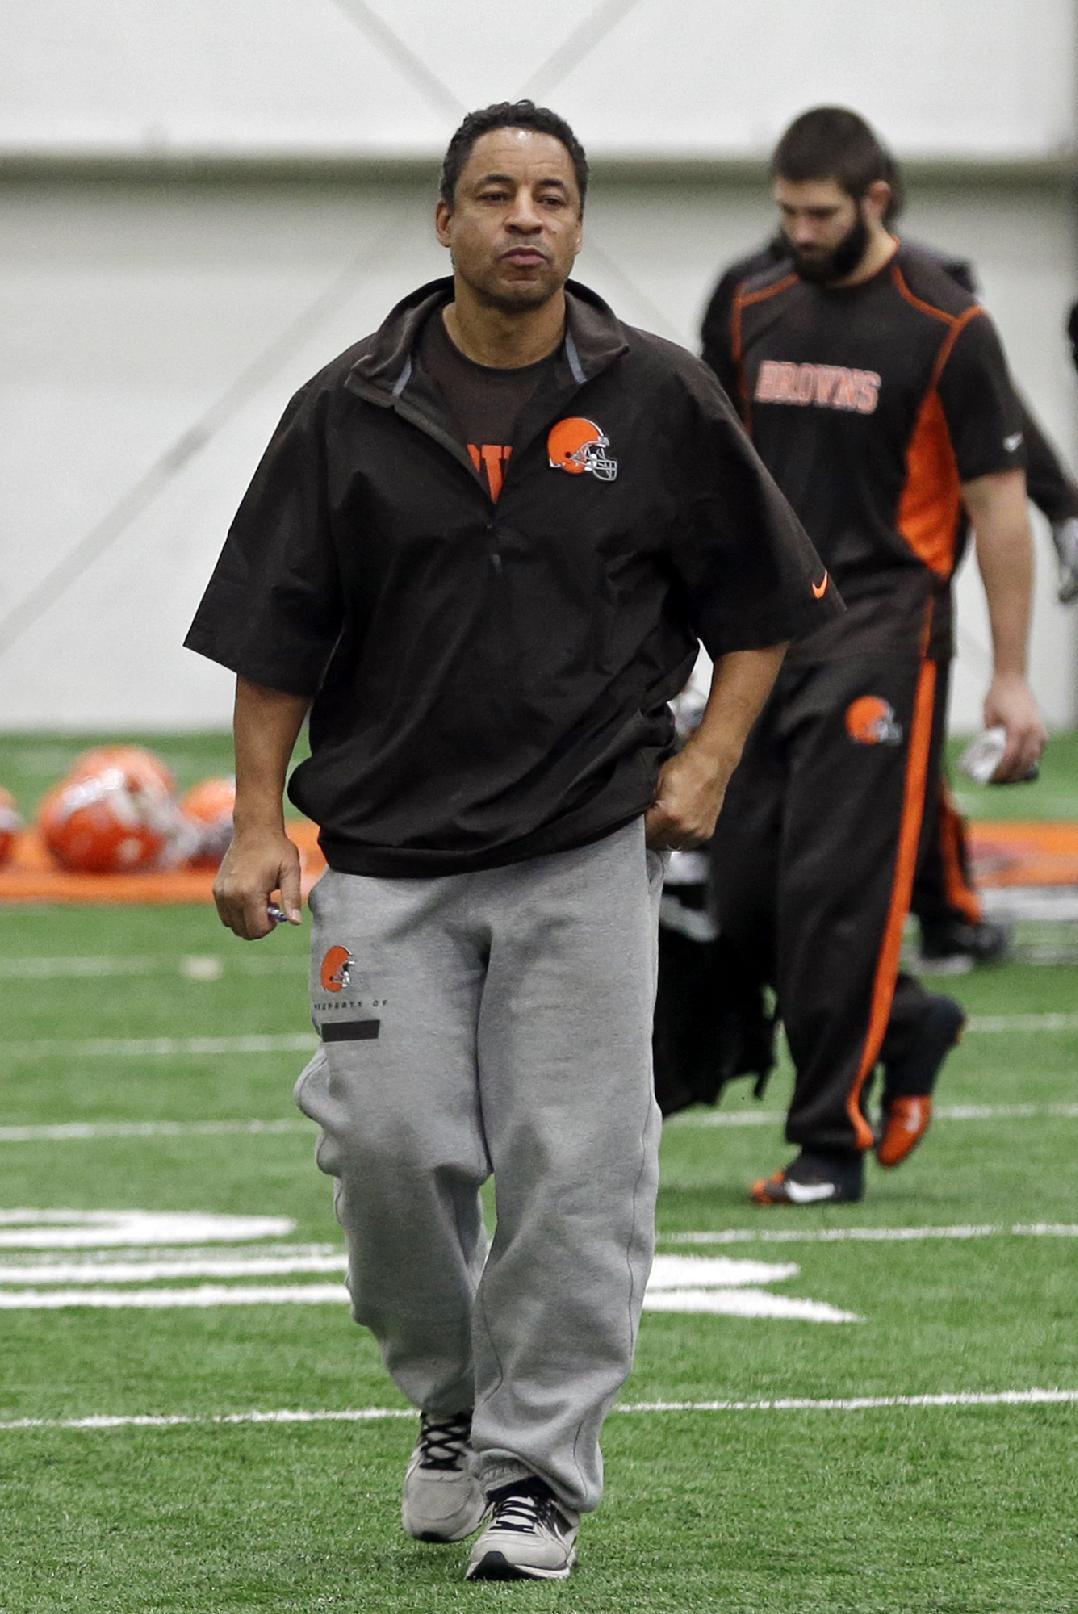 Browns' Horton says defense feeling pressure